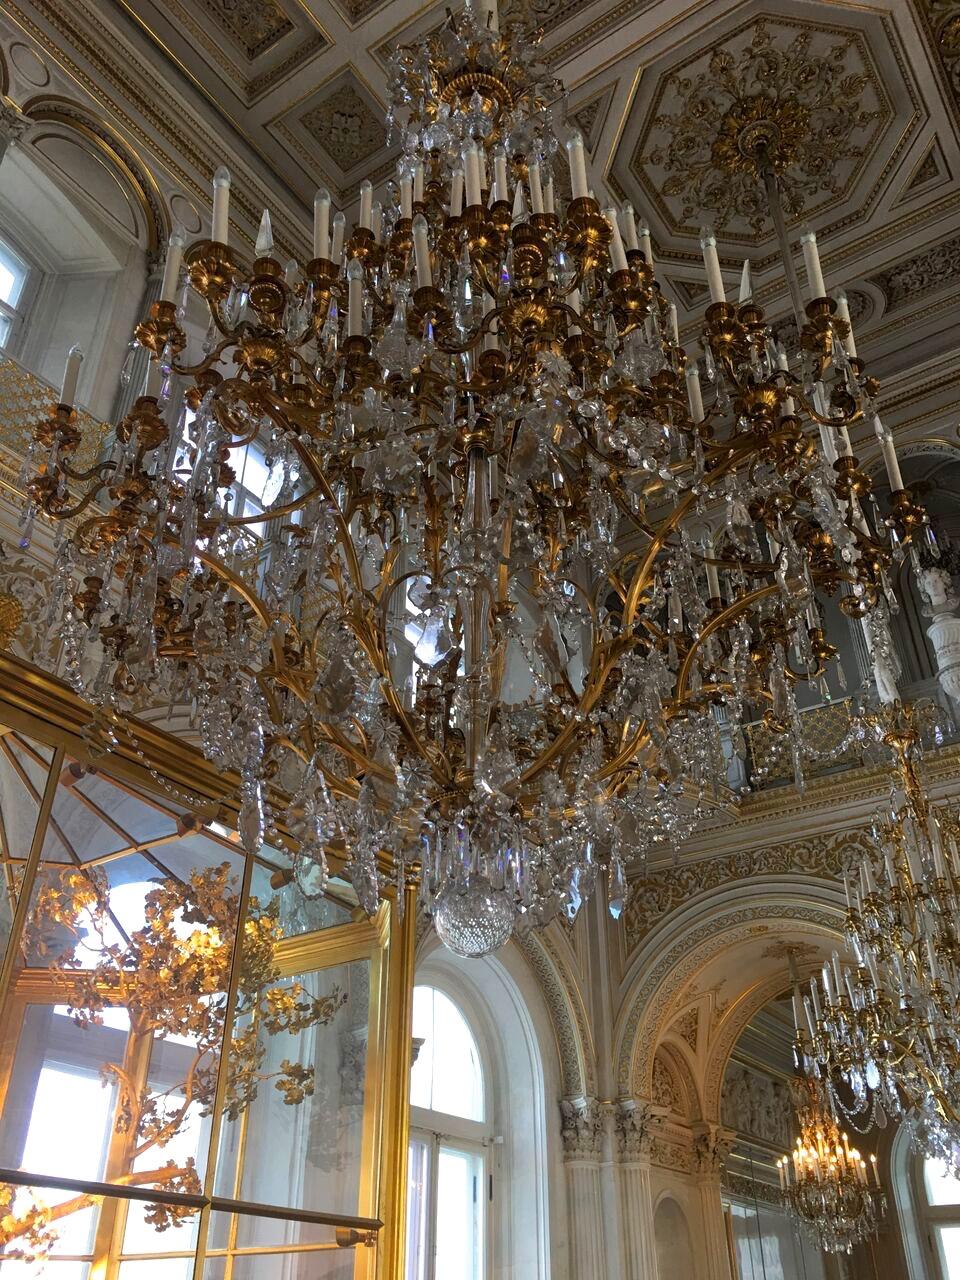 Teri_St.Petersburg_Hermitage_day2_spiritedtable_photo17.jpg